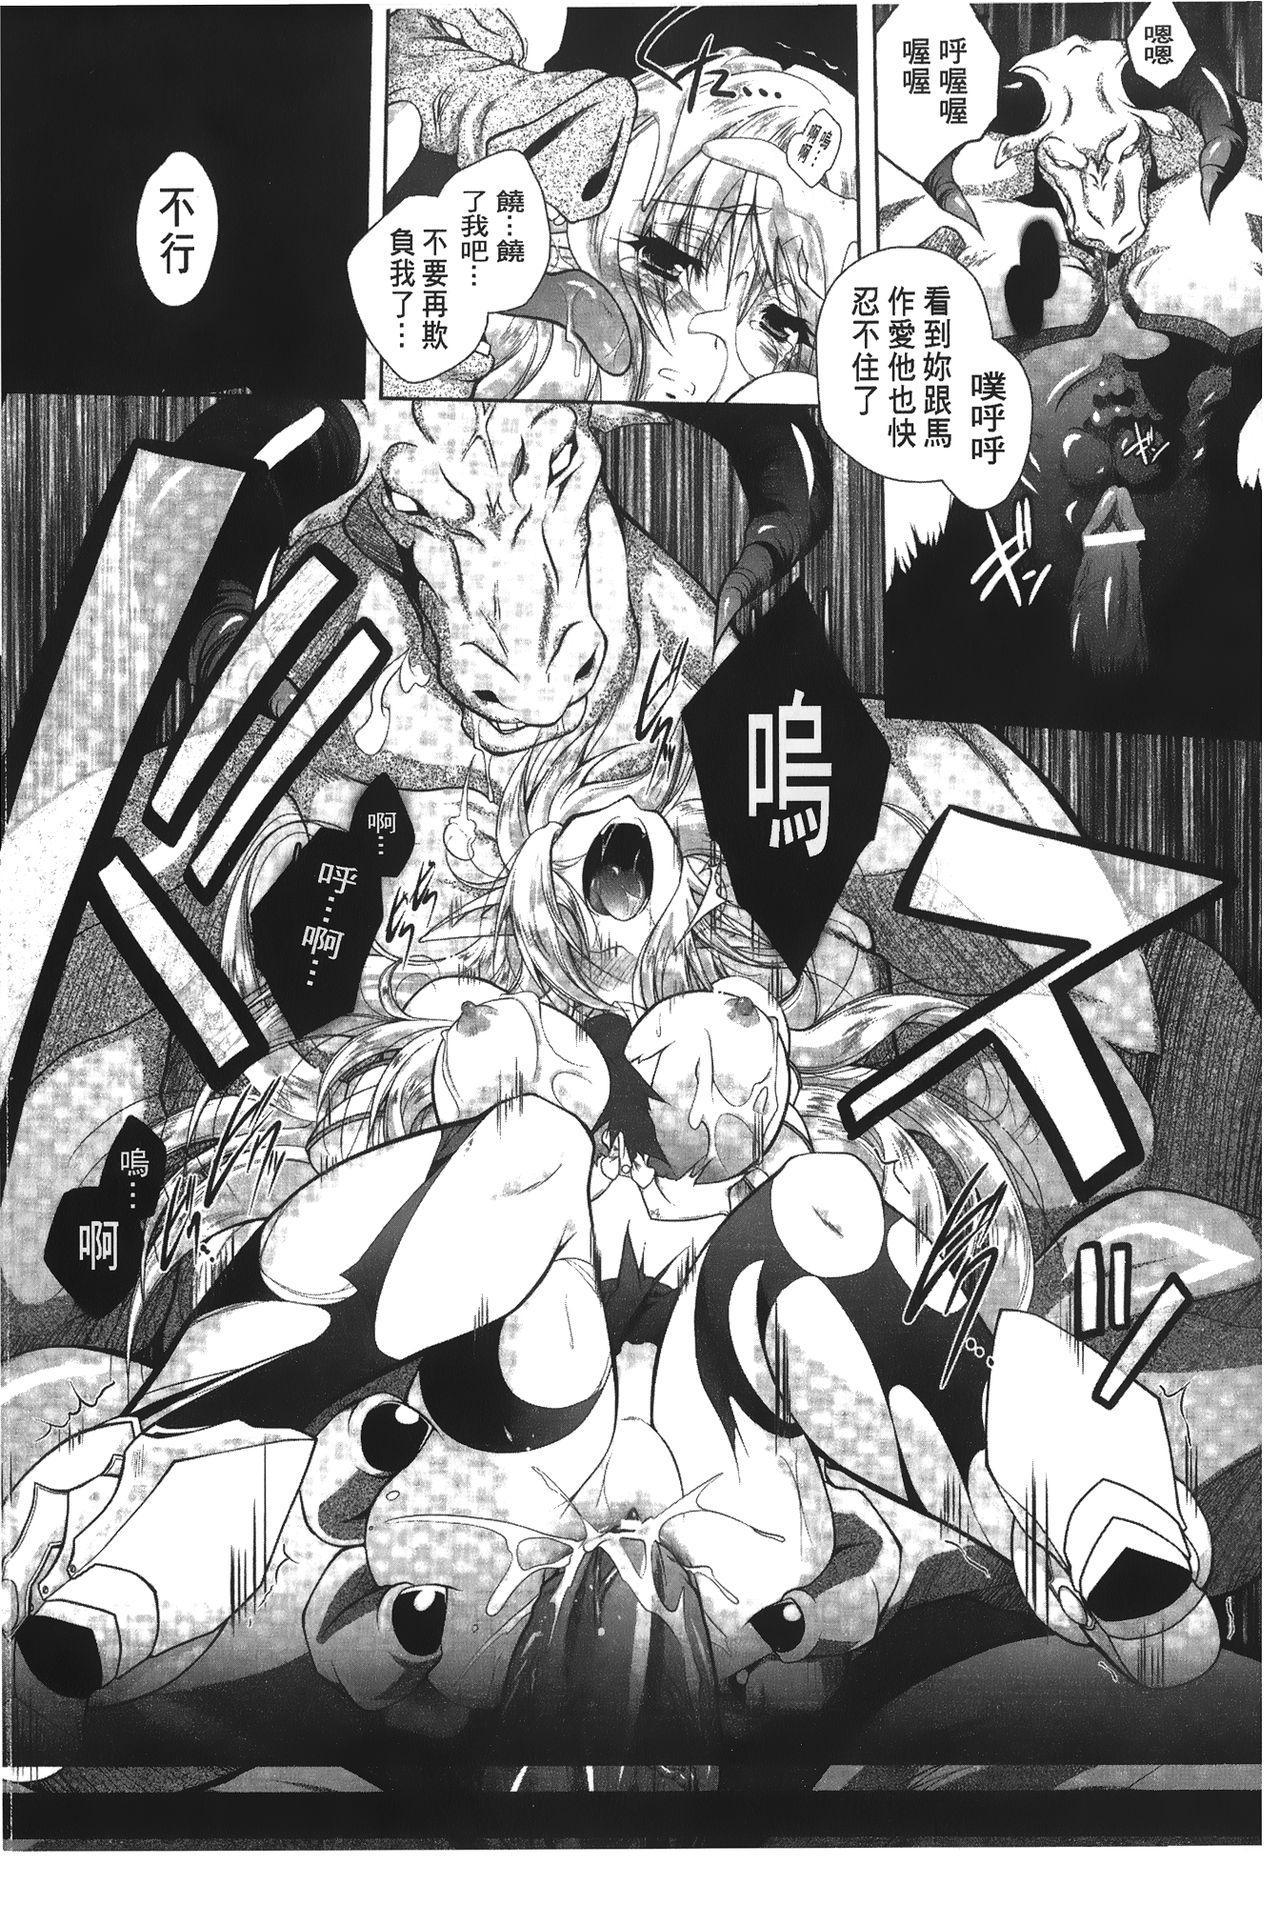 [Parfait] Datenshi-tachi no Rondo - Fallen Angels Rondo   墮天使們的圓舞曲 [Chinese] 43